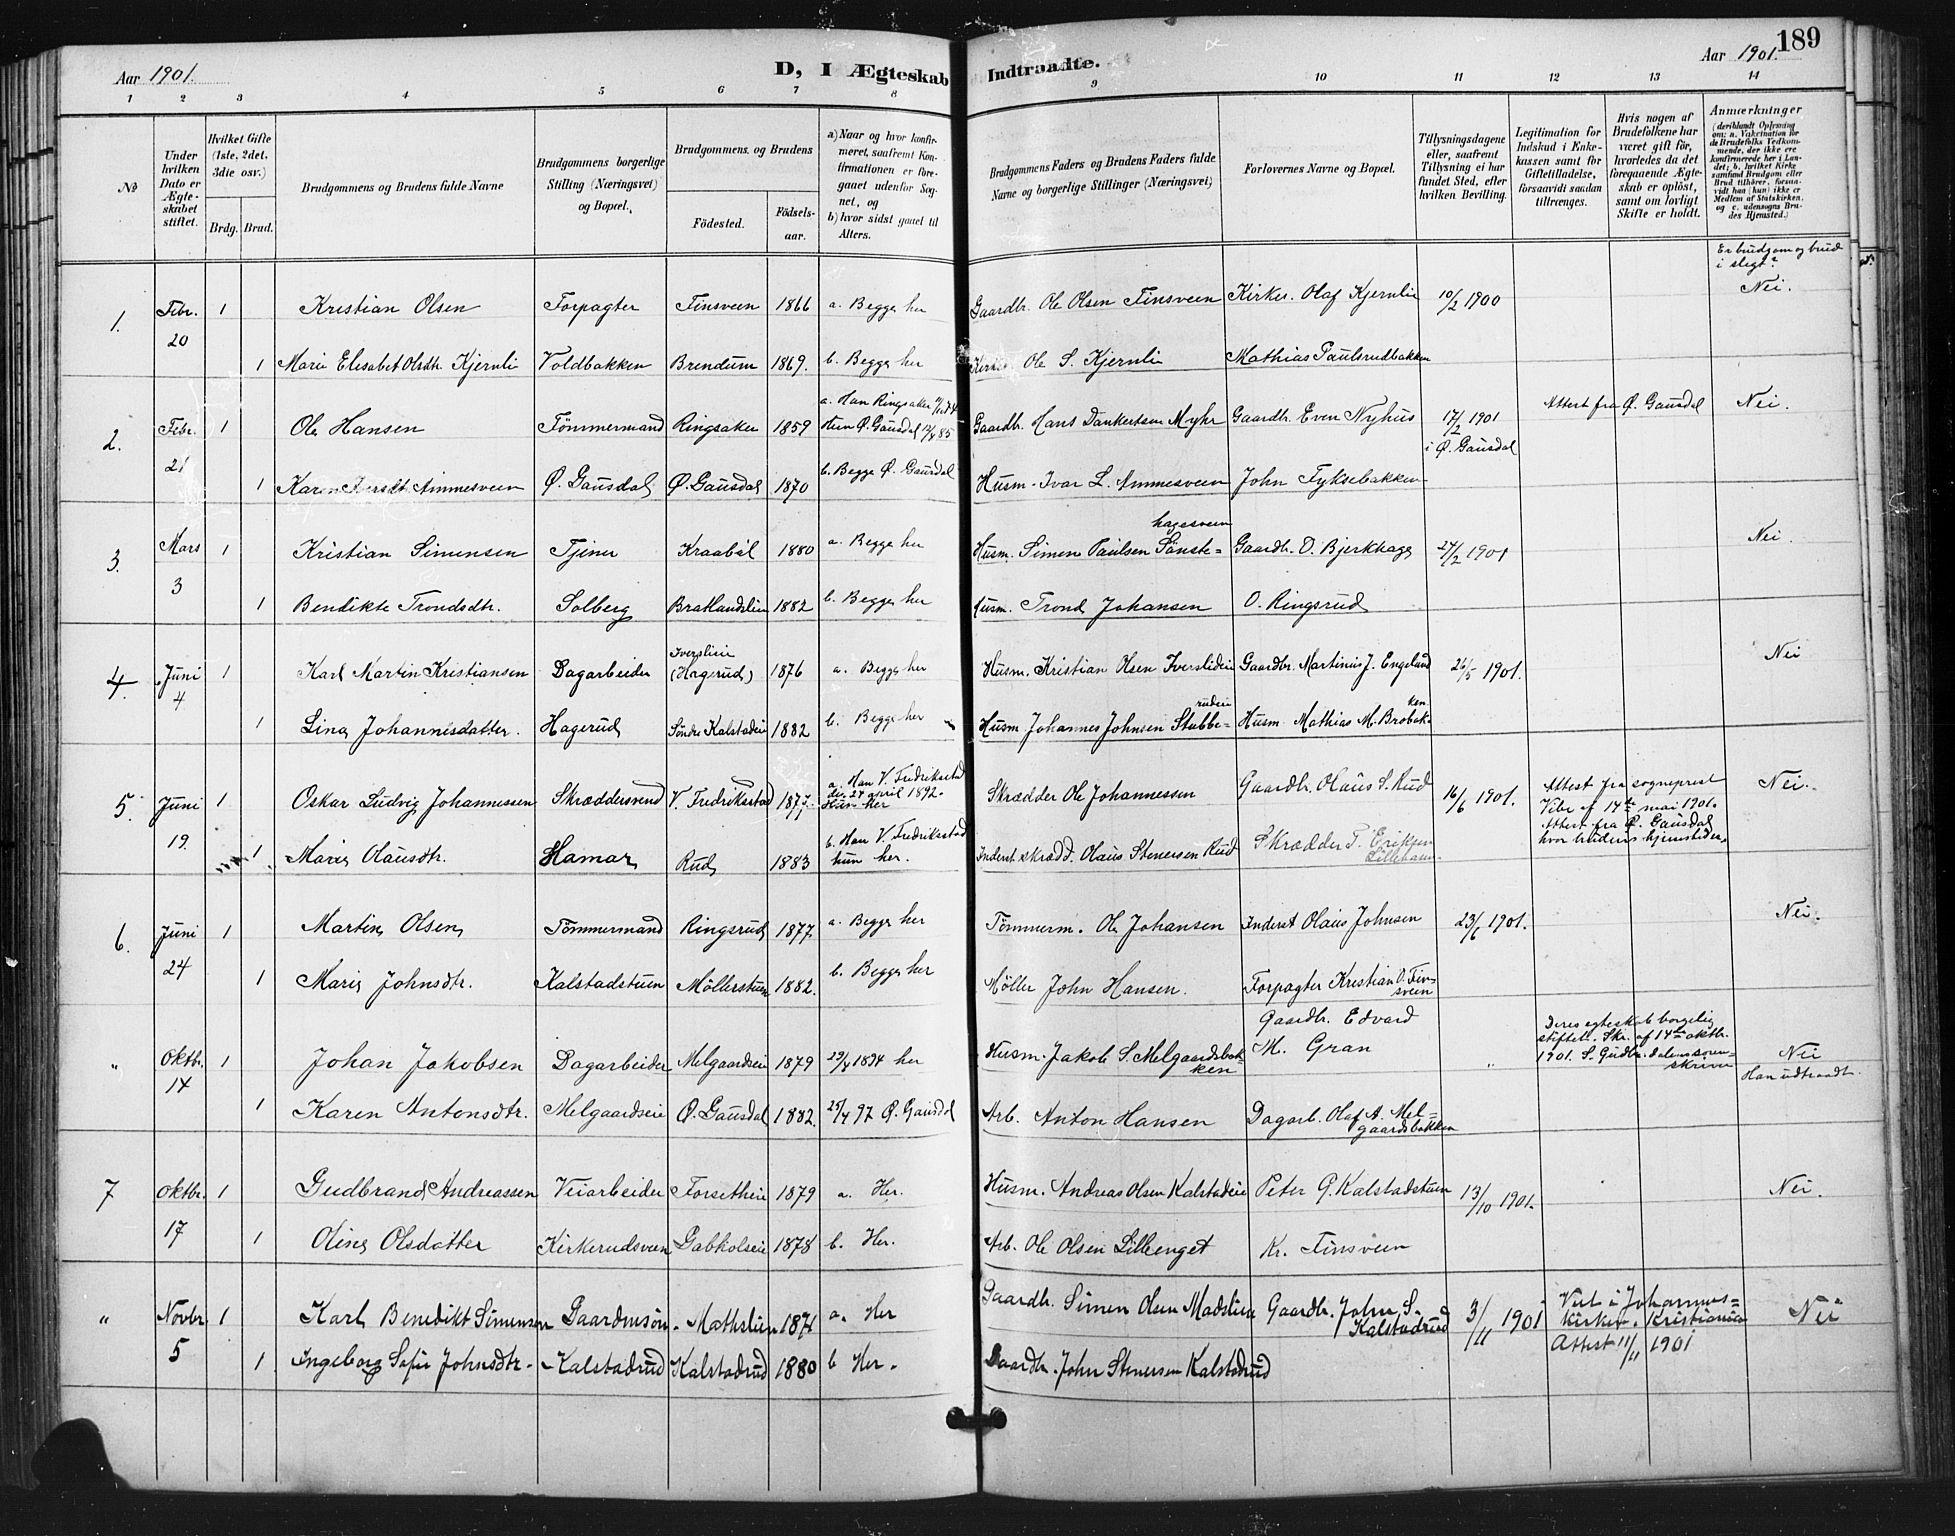 SAH, Vestre Gausdal prestekontor, Klokkerbok nr. 3, 1896-1925, s. 189